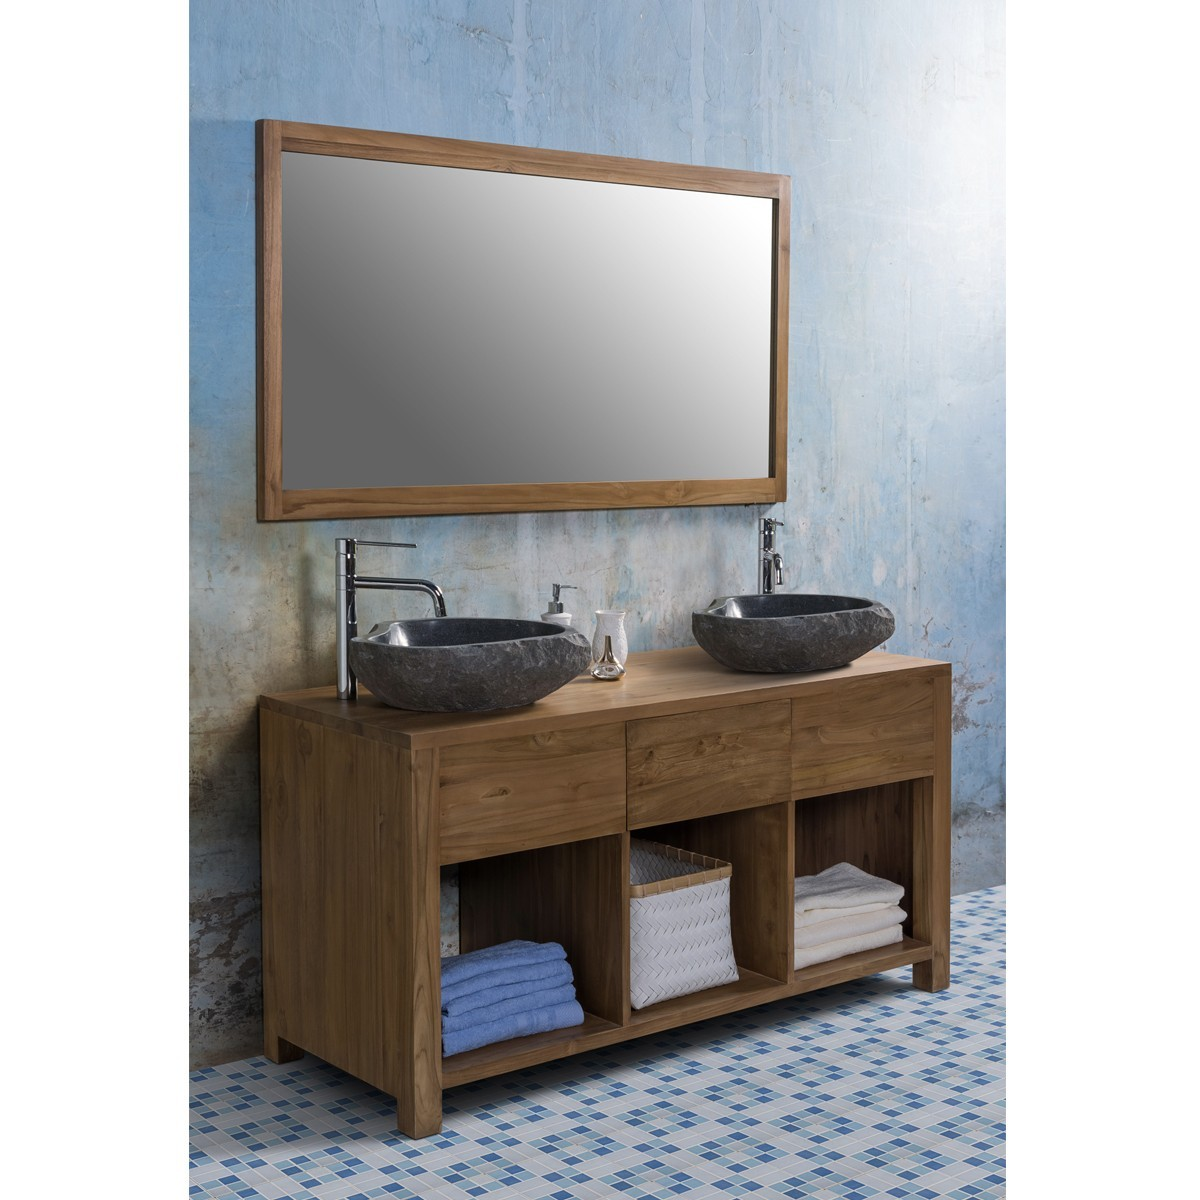 ensemble de salle de bain en bois de teck meuble de salle de bain teck 145 2 vasques. Black Bedroom Furniture Sets. Home Design Ideas